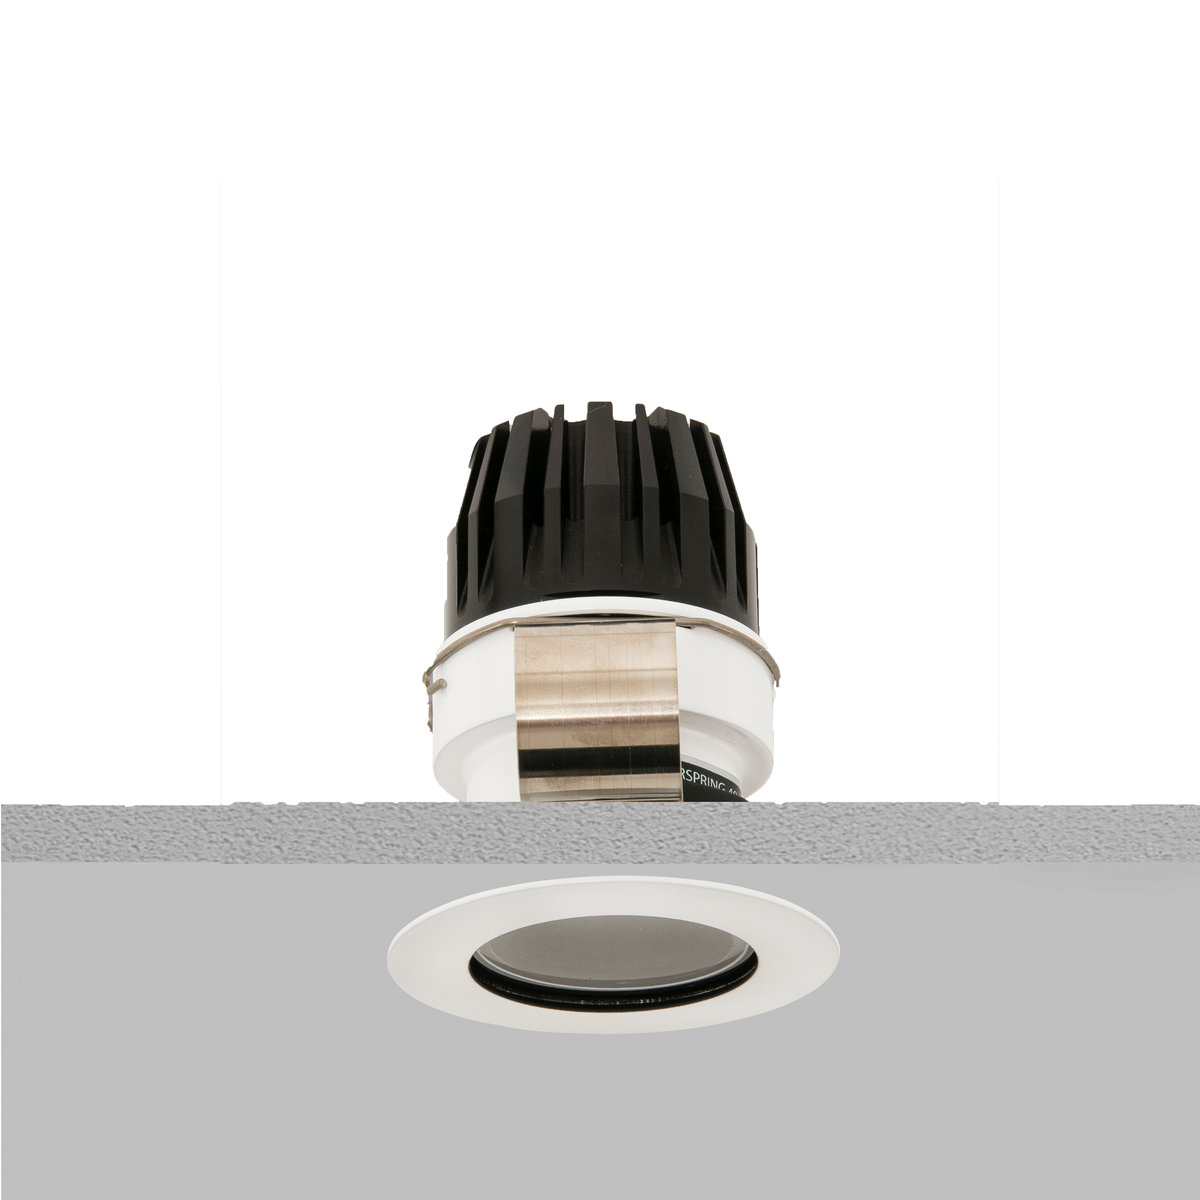 Waterspring 40 IP Rated Downlight main image